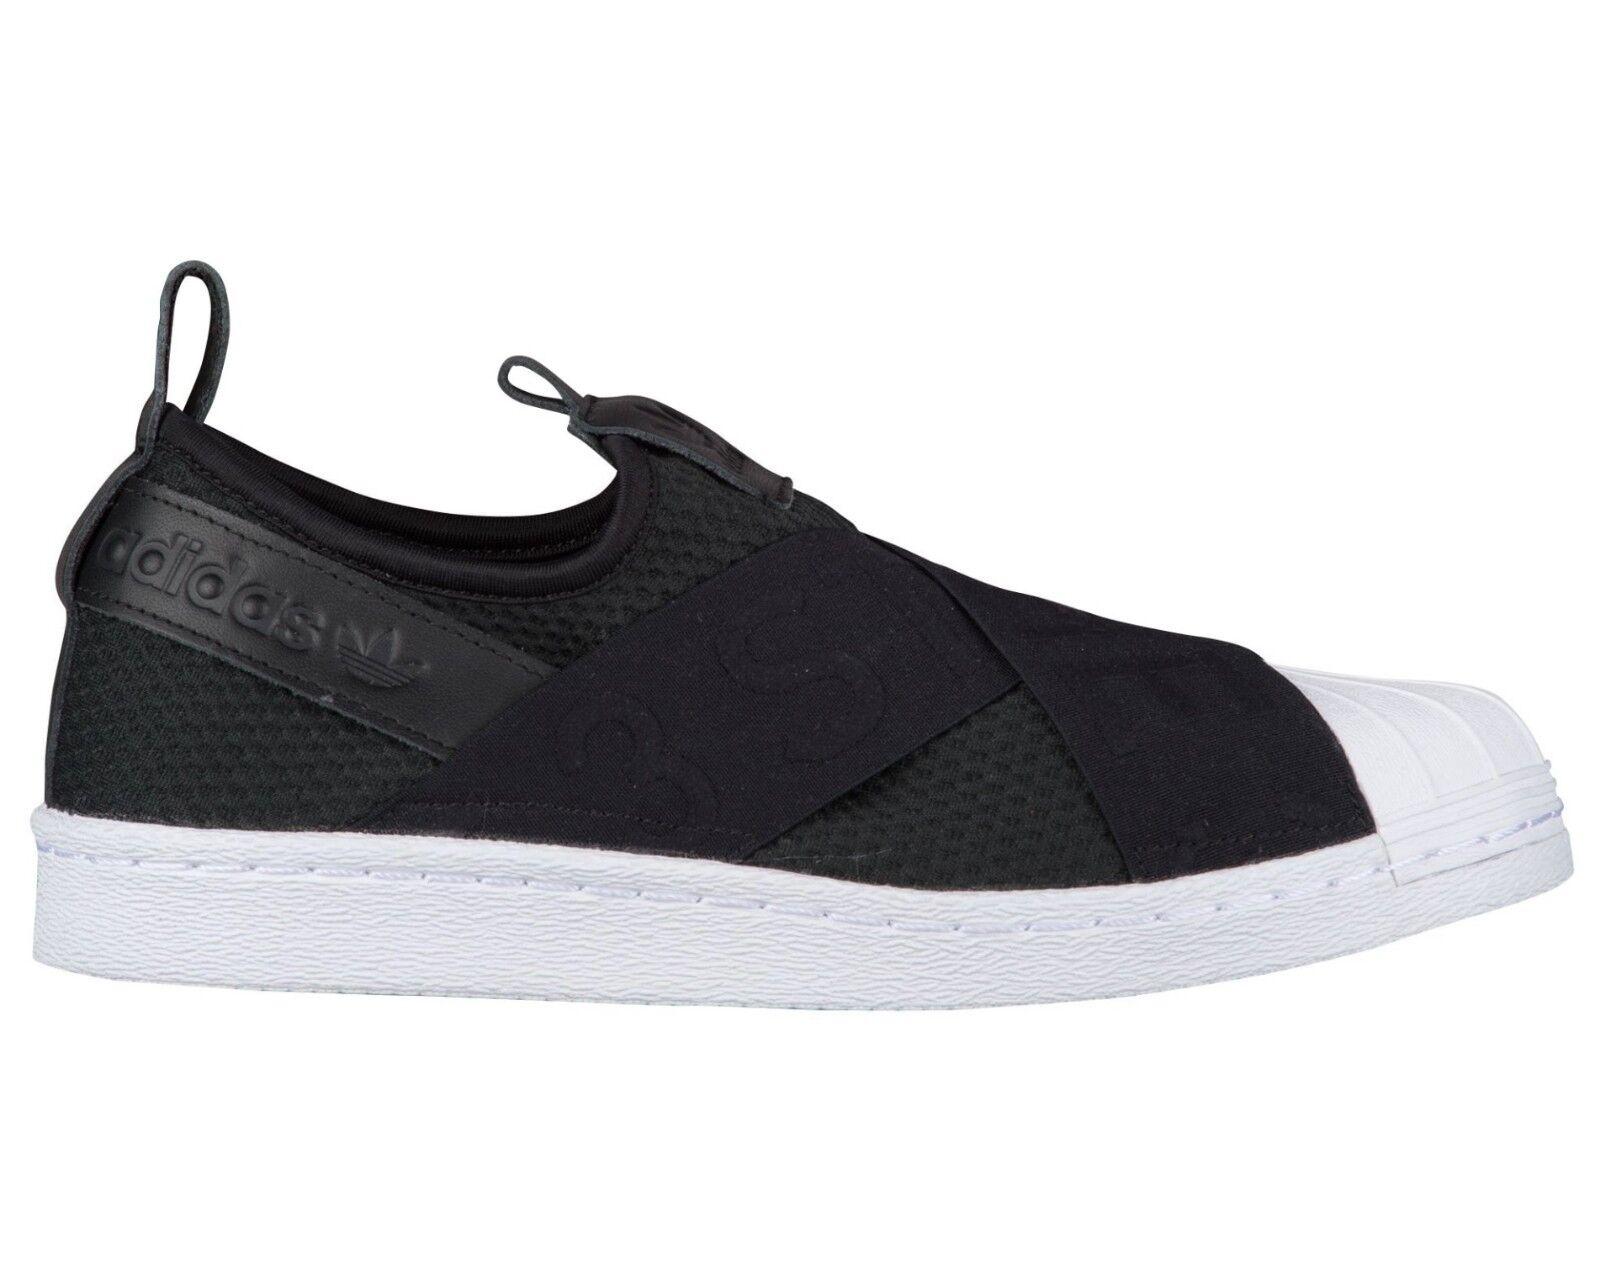 Adidas Superstar Slip On Womens CQ2382 Black White Neoprene Shell shoes Size 9